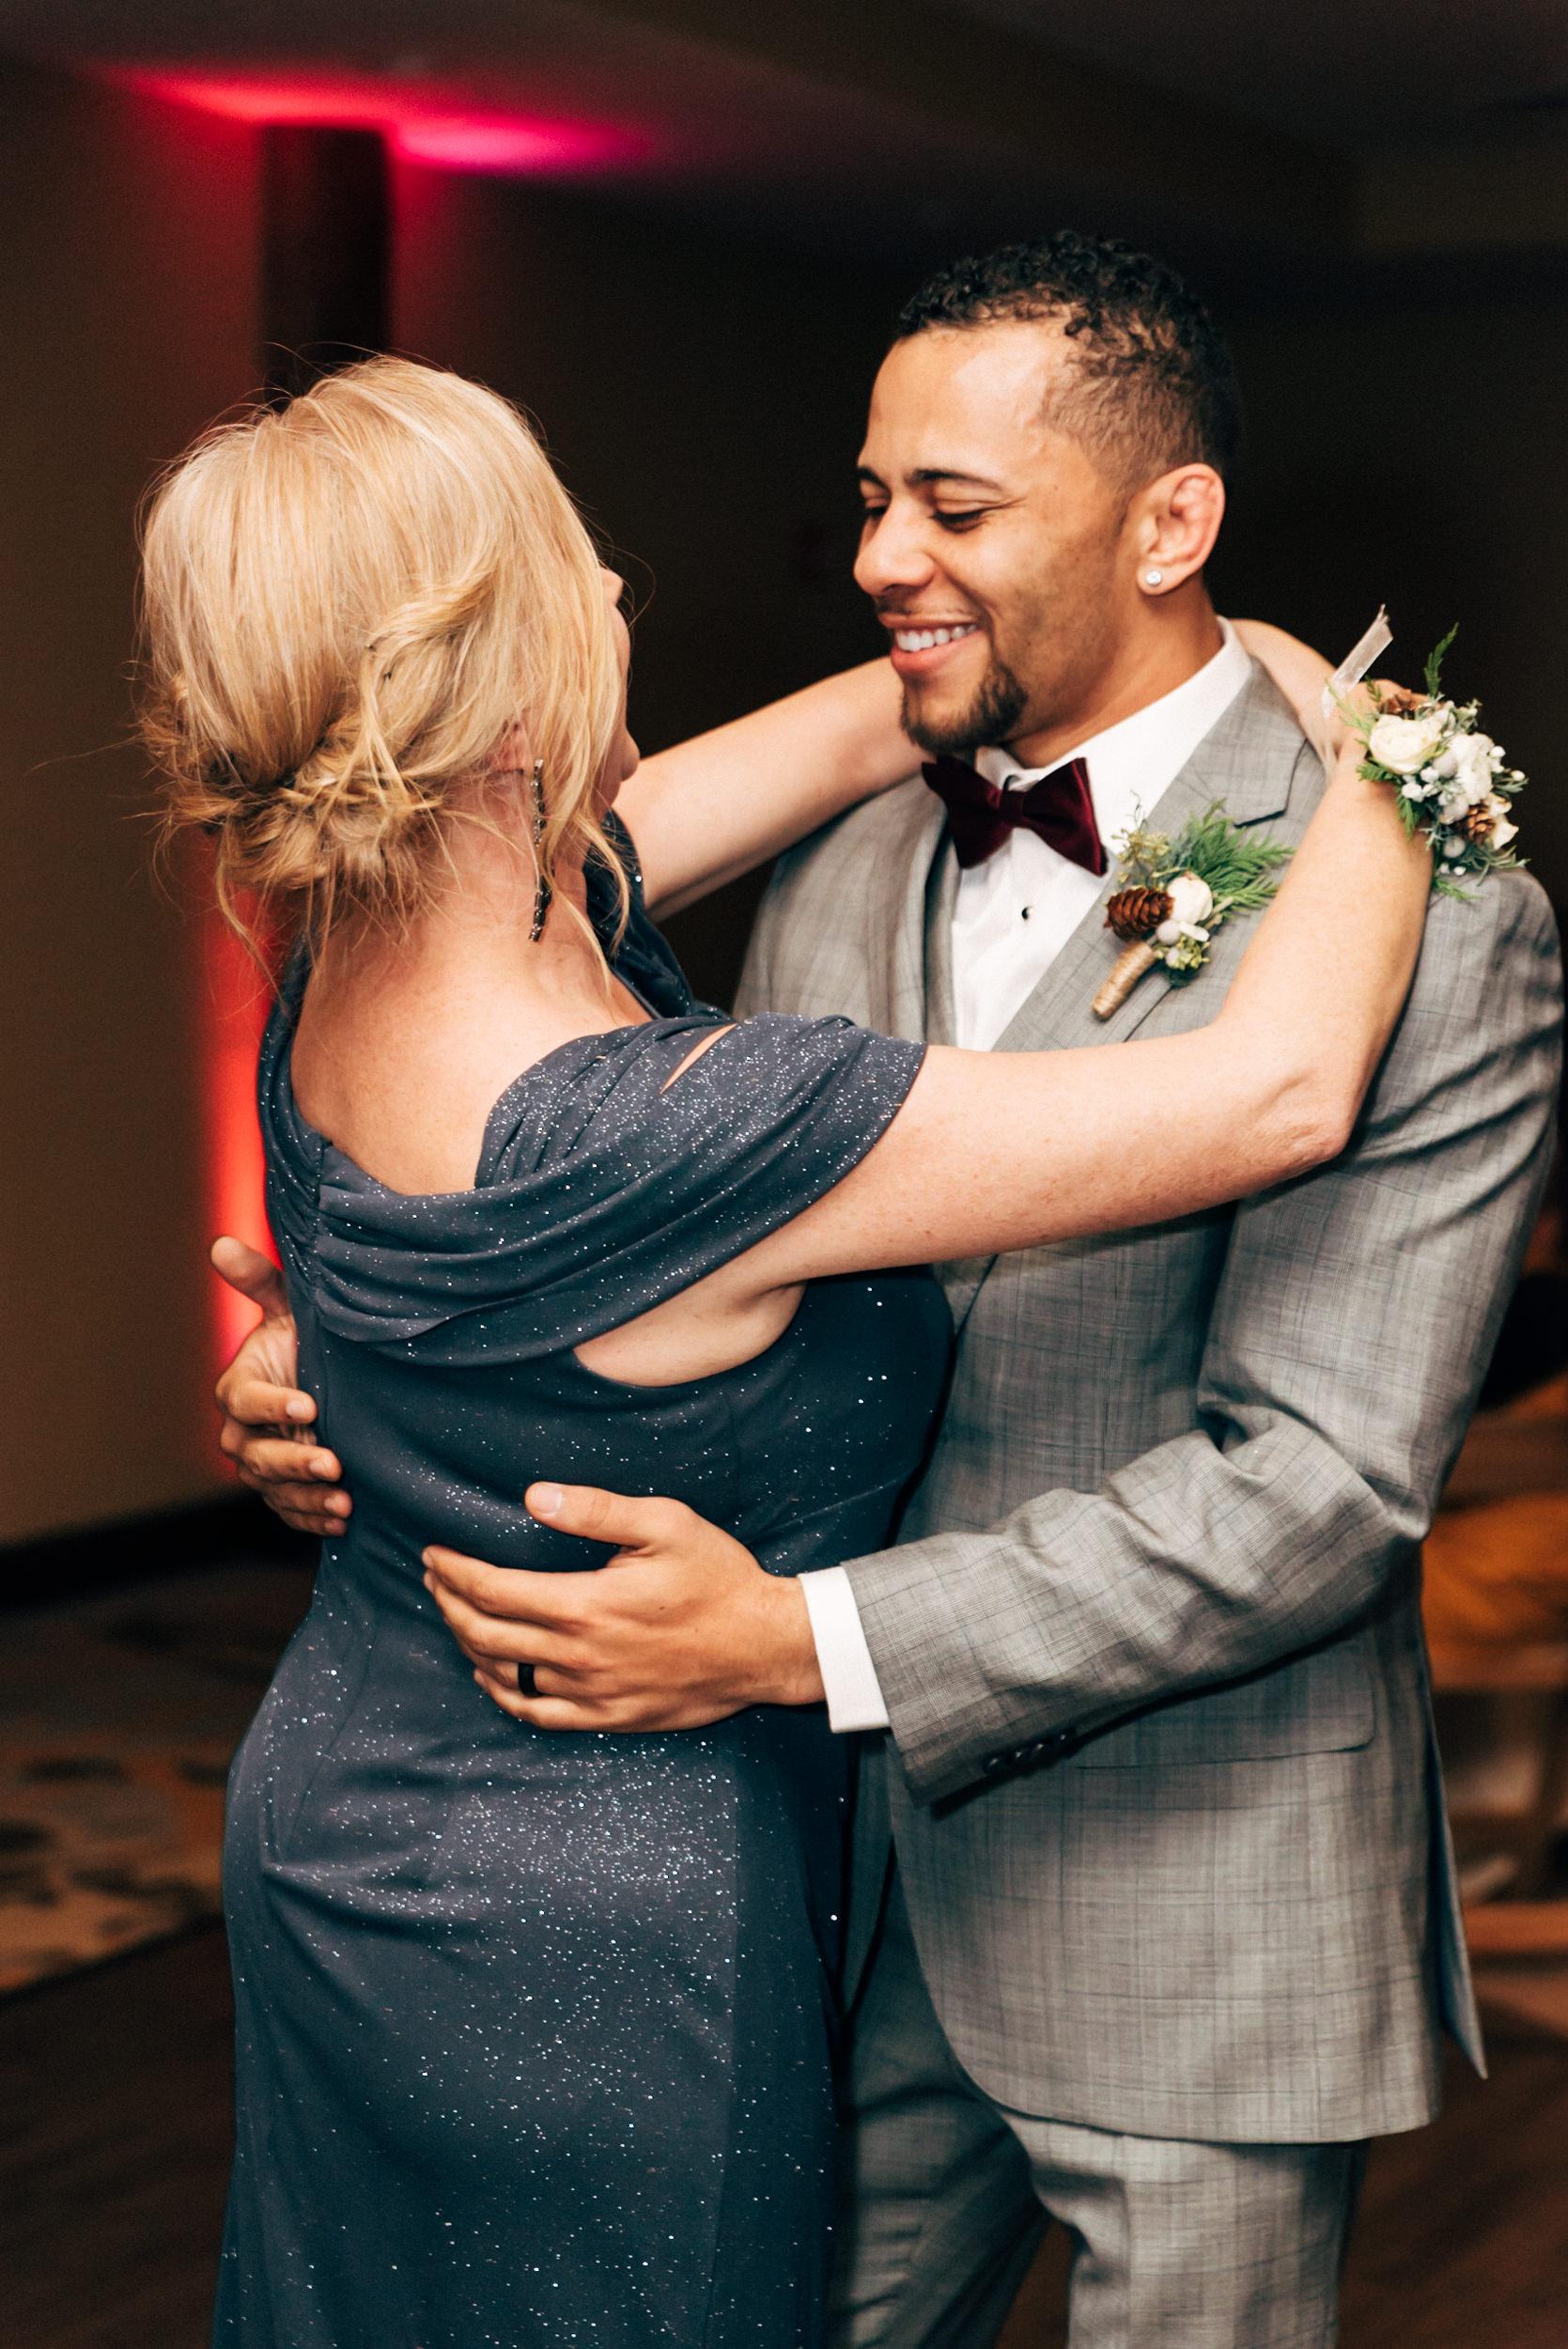 Colorado-Wedding-Photographer-Breckinridge-Mountain-Adventure-Elopement-75.jpg